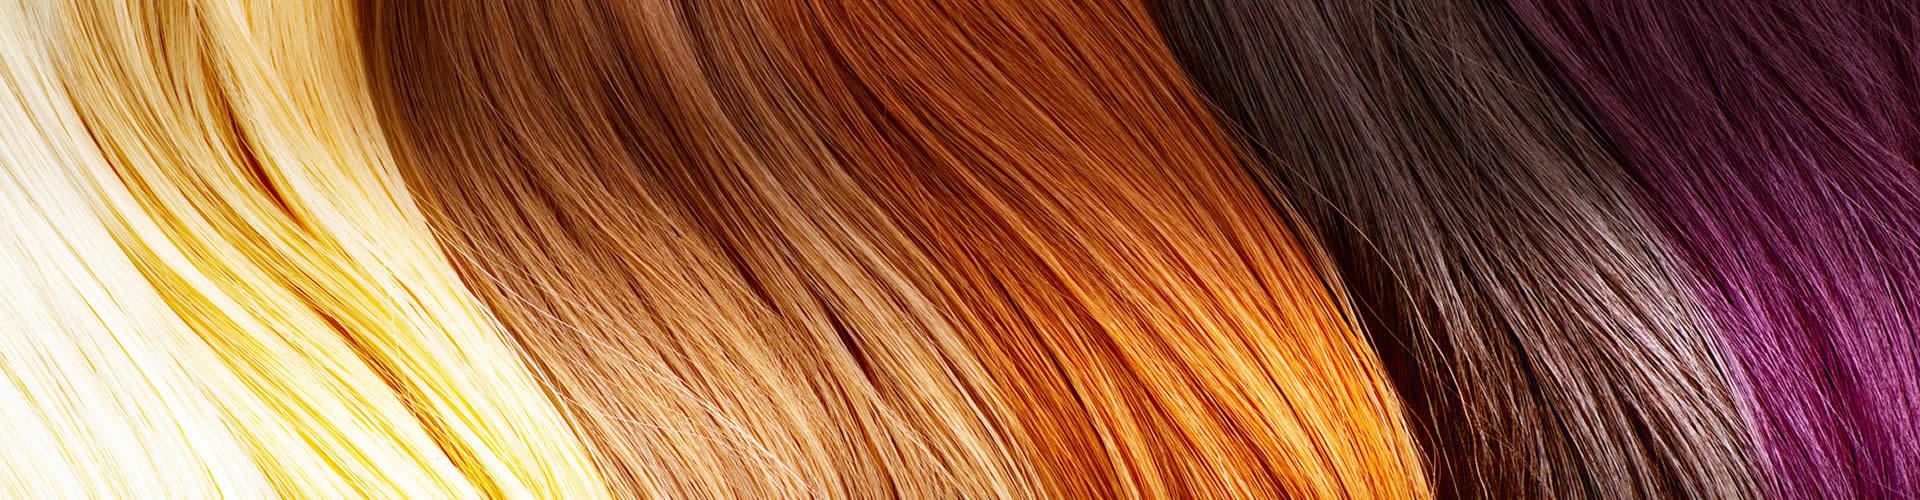 Hair salon wallpaper wallpapersafari for Salon wallpaper